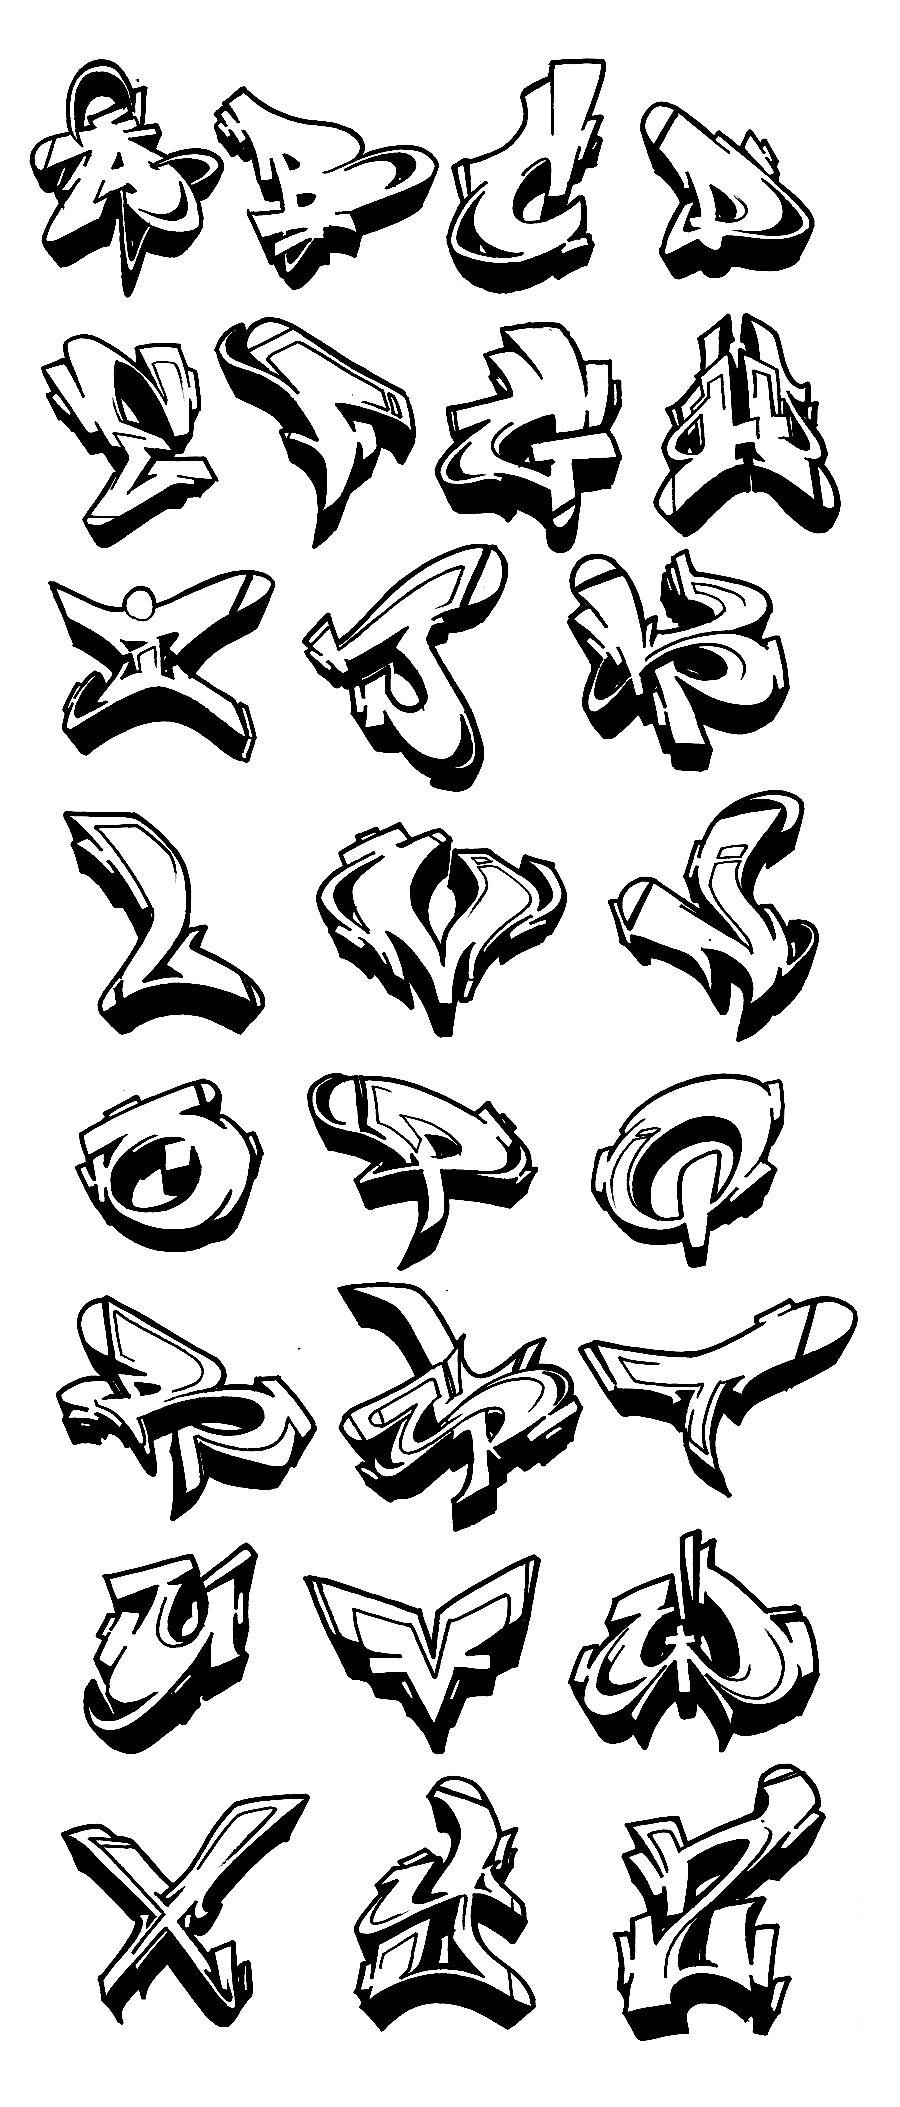 Graffiti Alphabet Wildstyle A Z 3D Graffiti Collection innen Graffiti Buchstaben Vorlagen A-Z